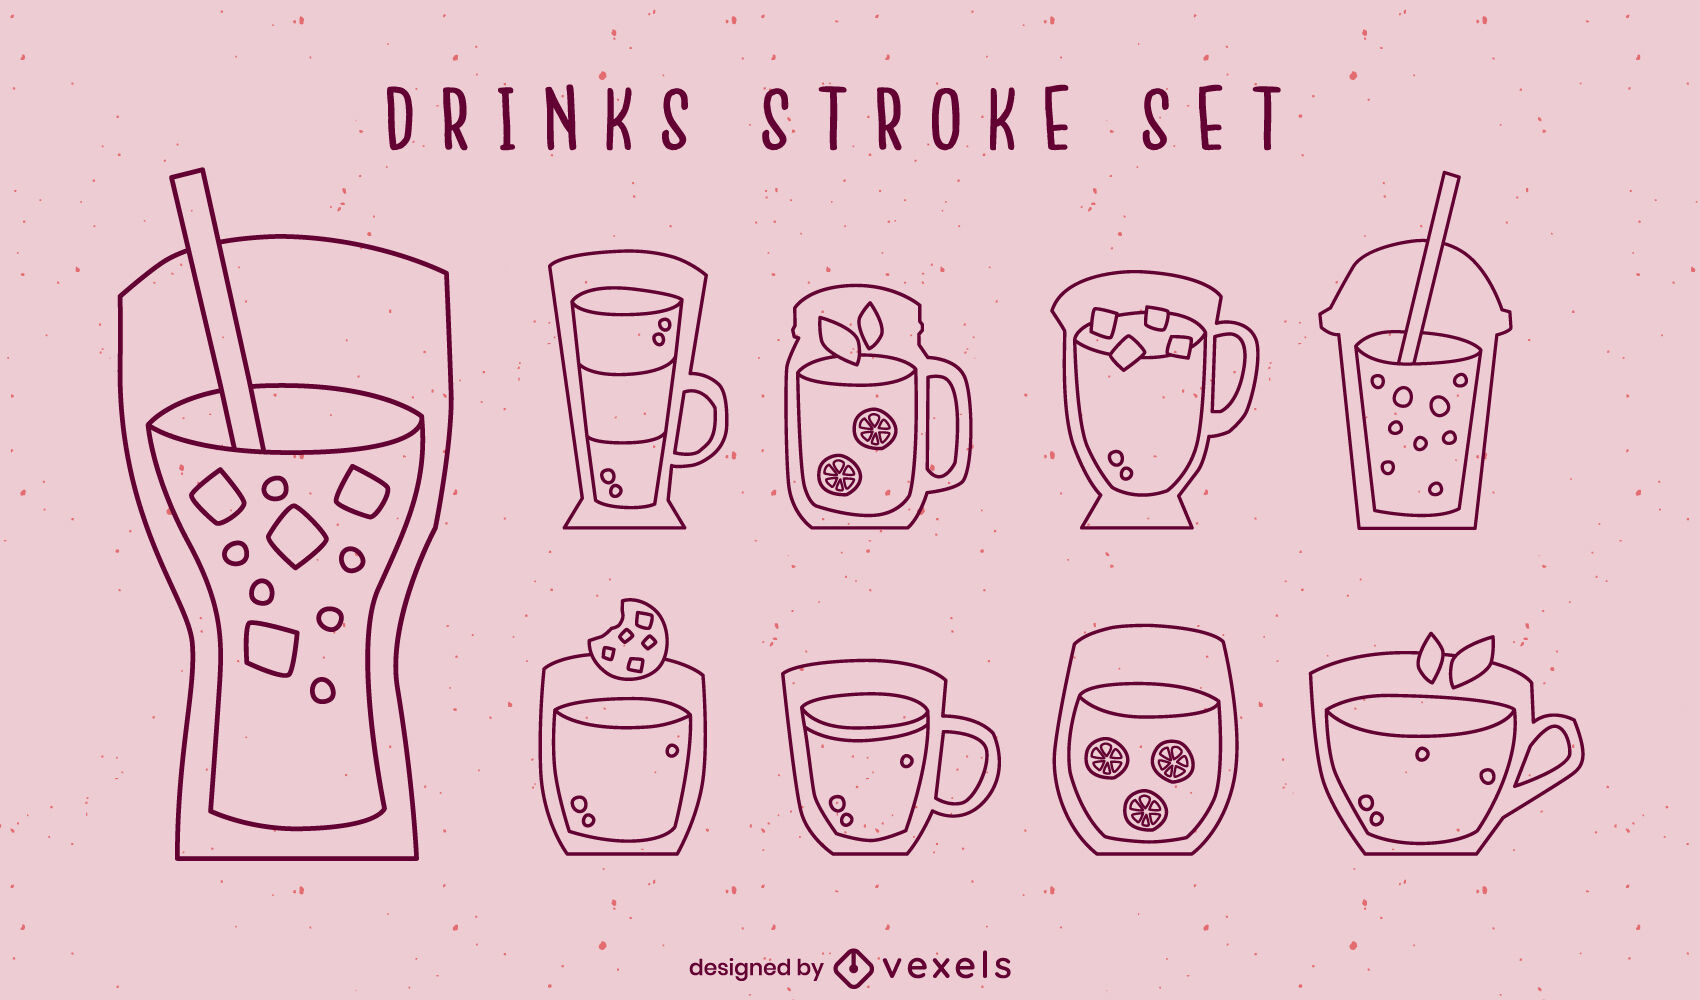 Drink glasses stroke set